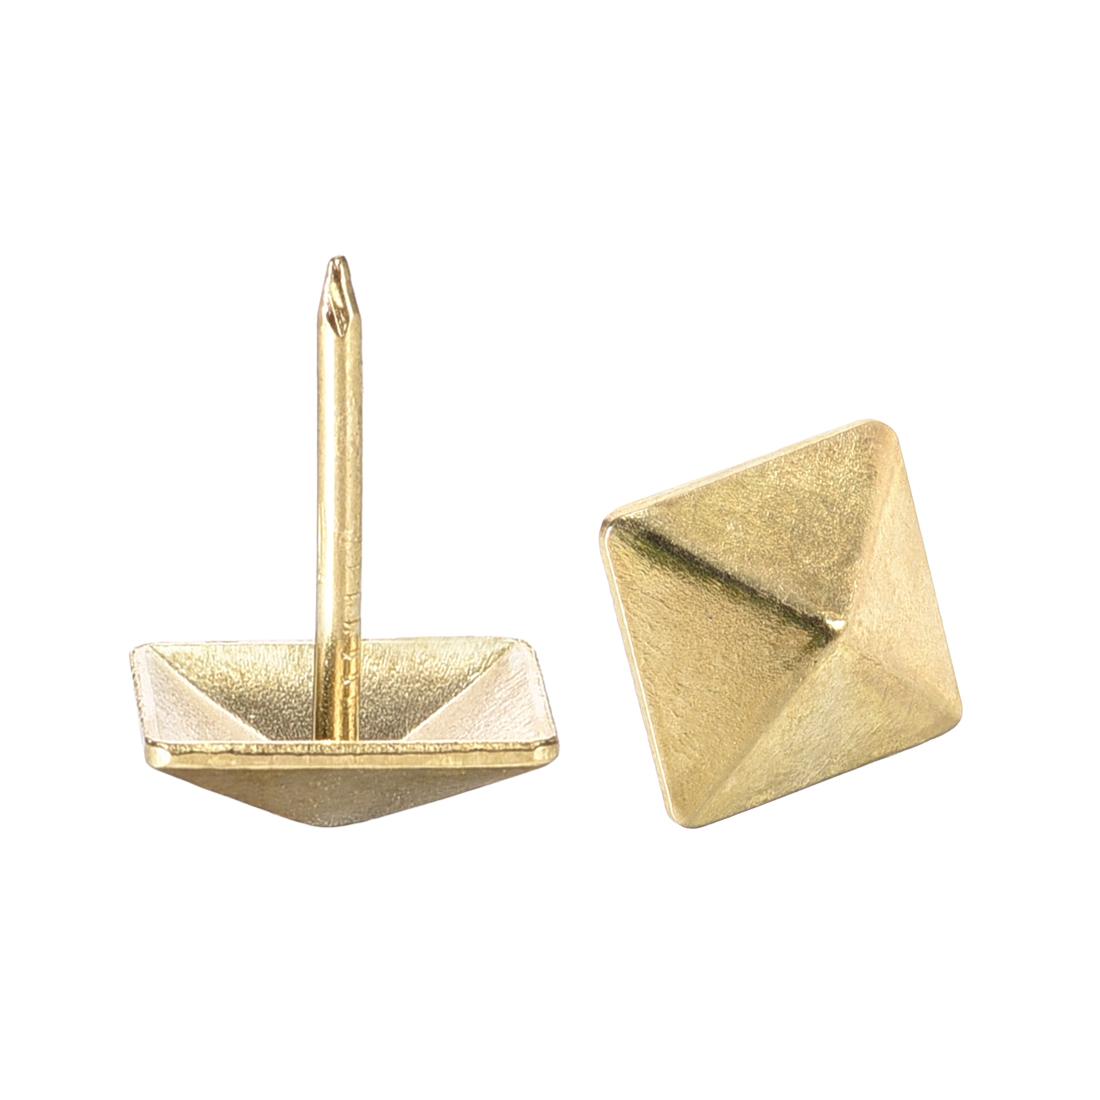 Upholstery Nails Tacks 12mm Square Head 17mm Height Nails Pins Gold Tone 25 Pcs